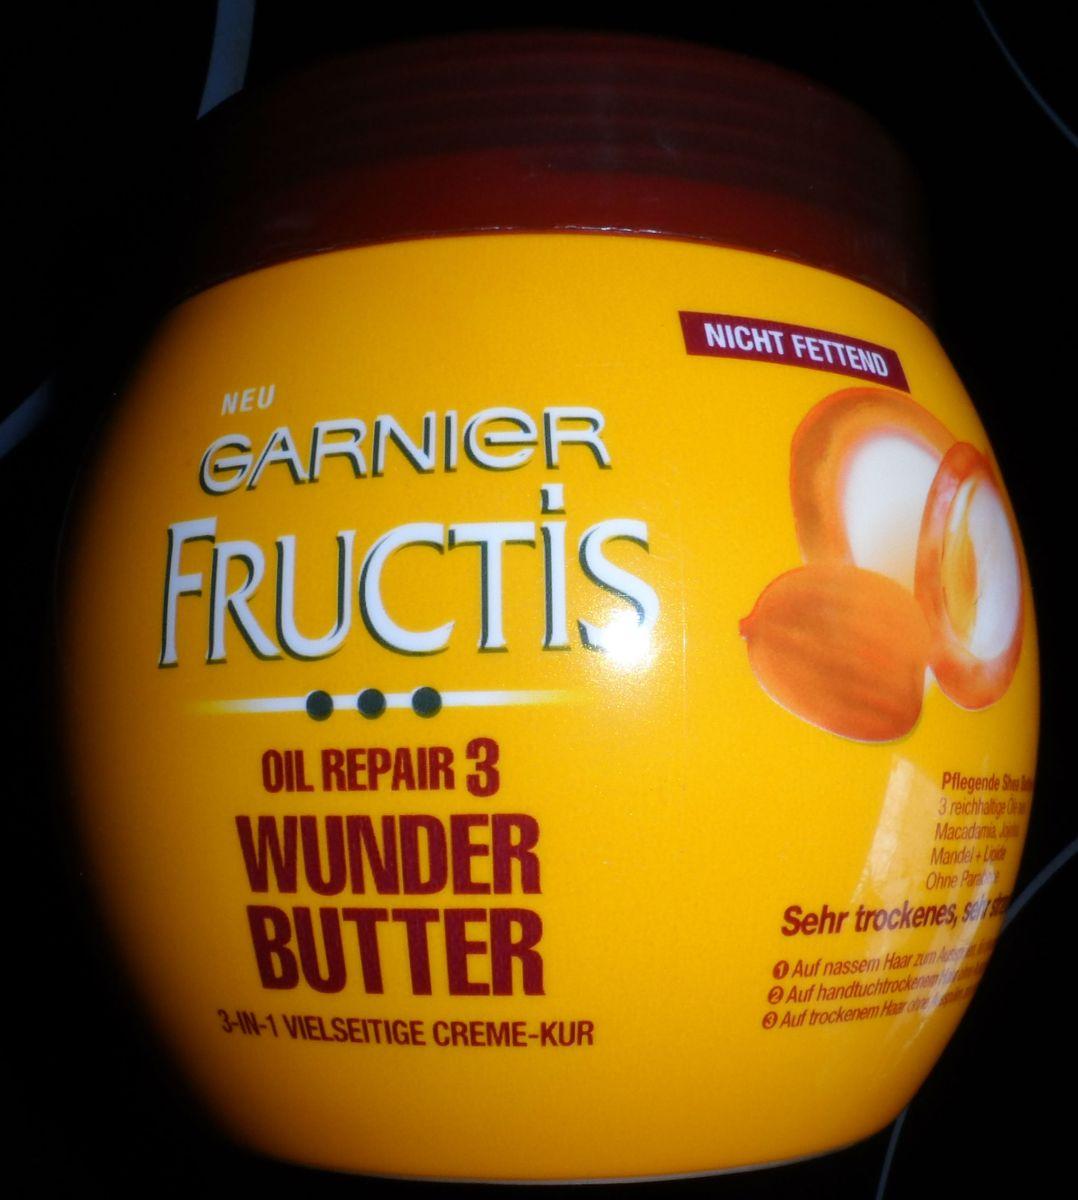 Garnier Fructis Oil Repair 3 Wunder Butter